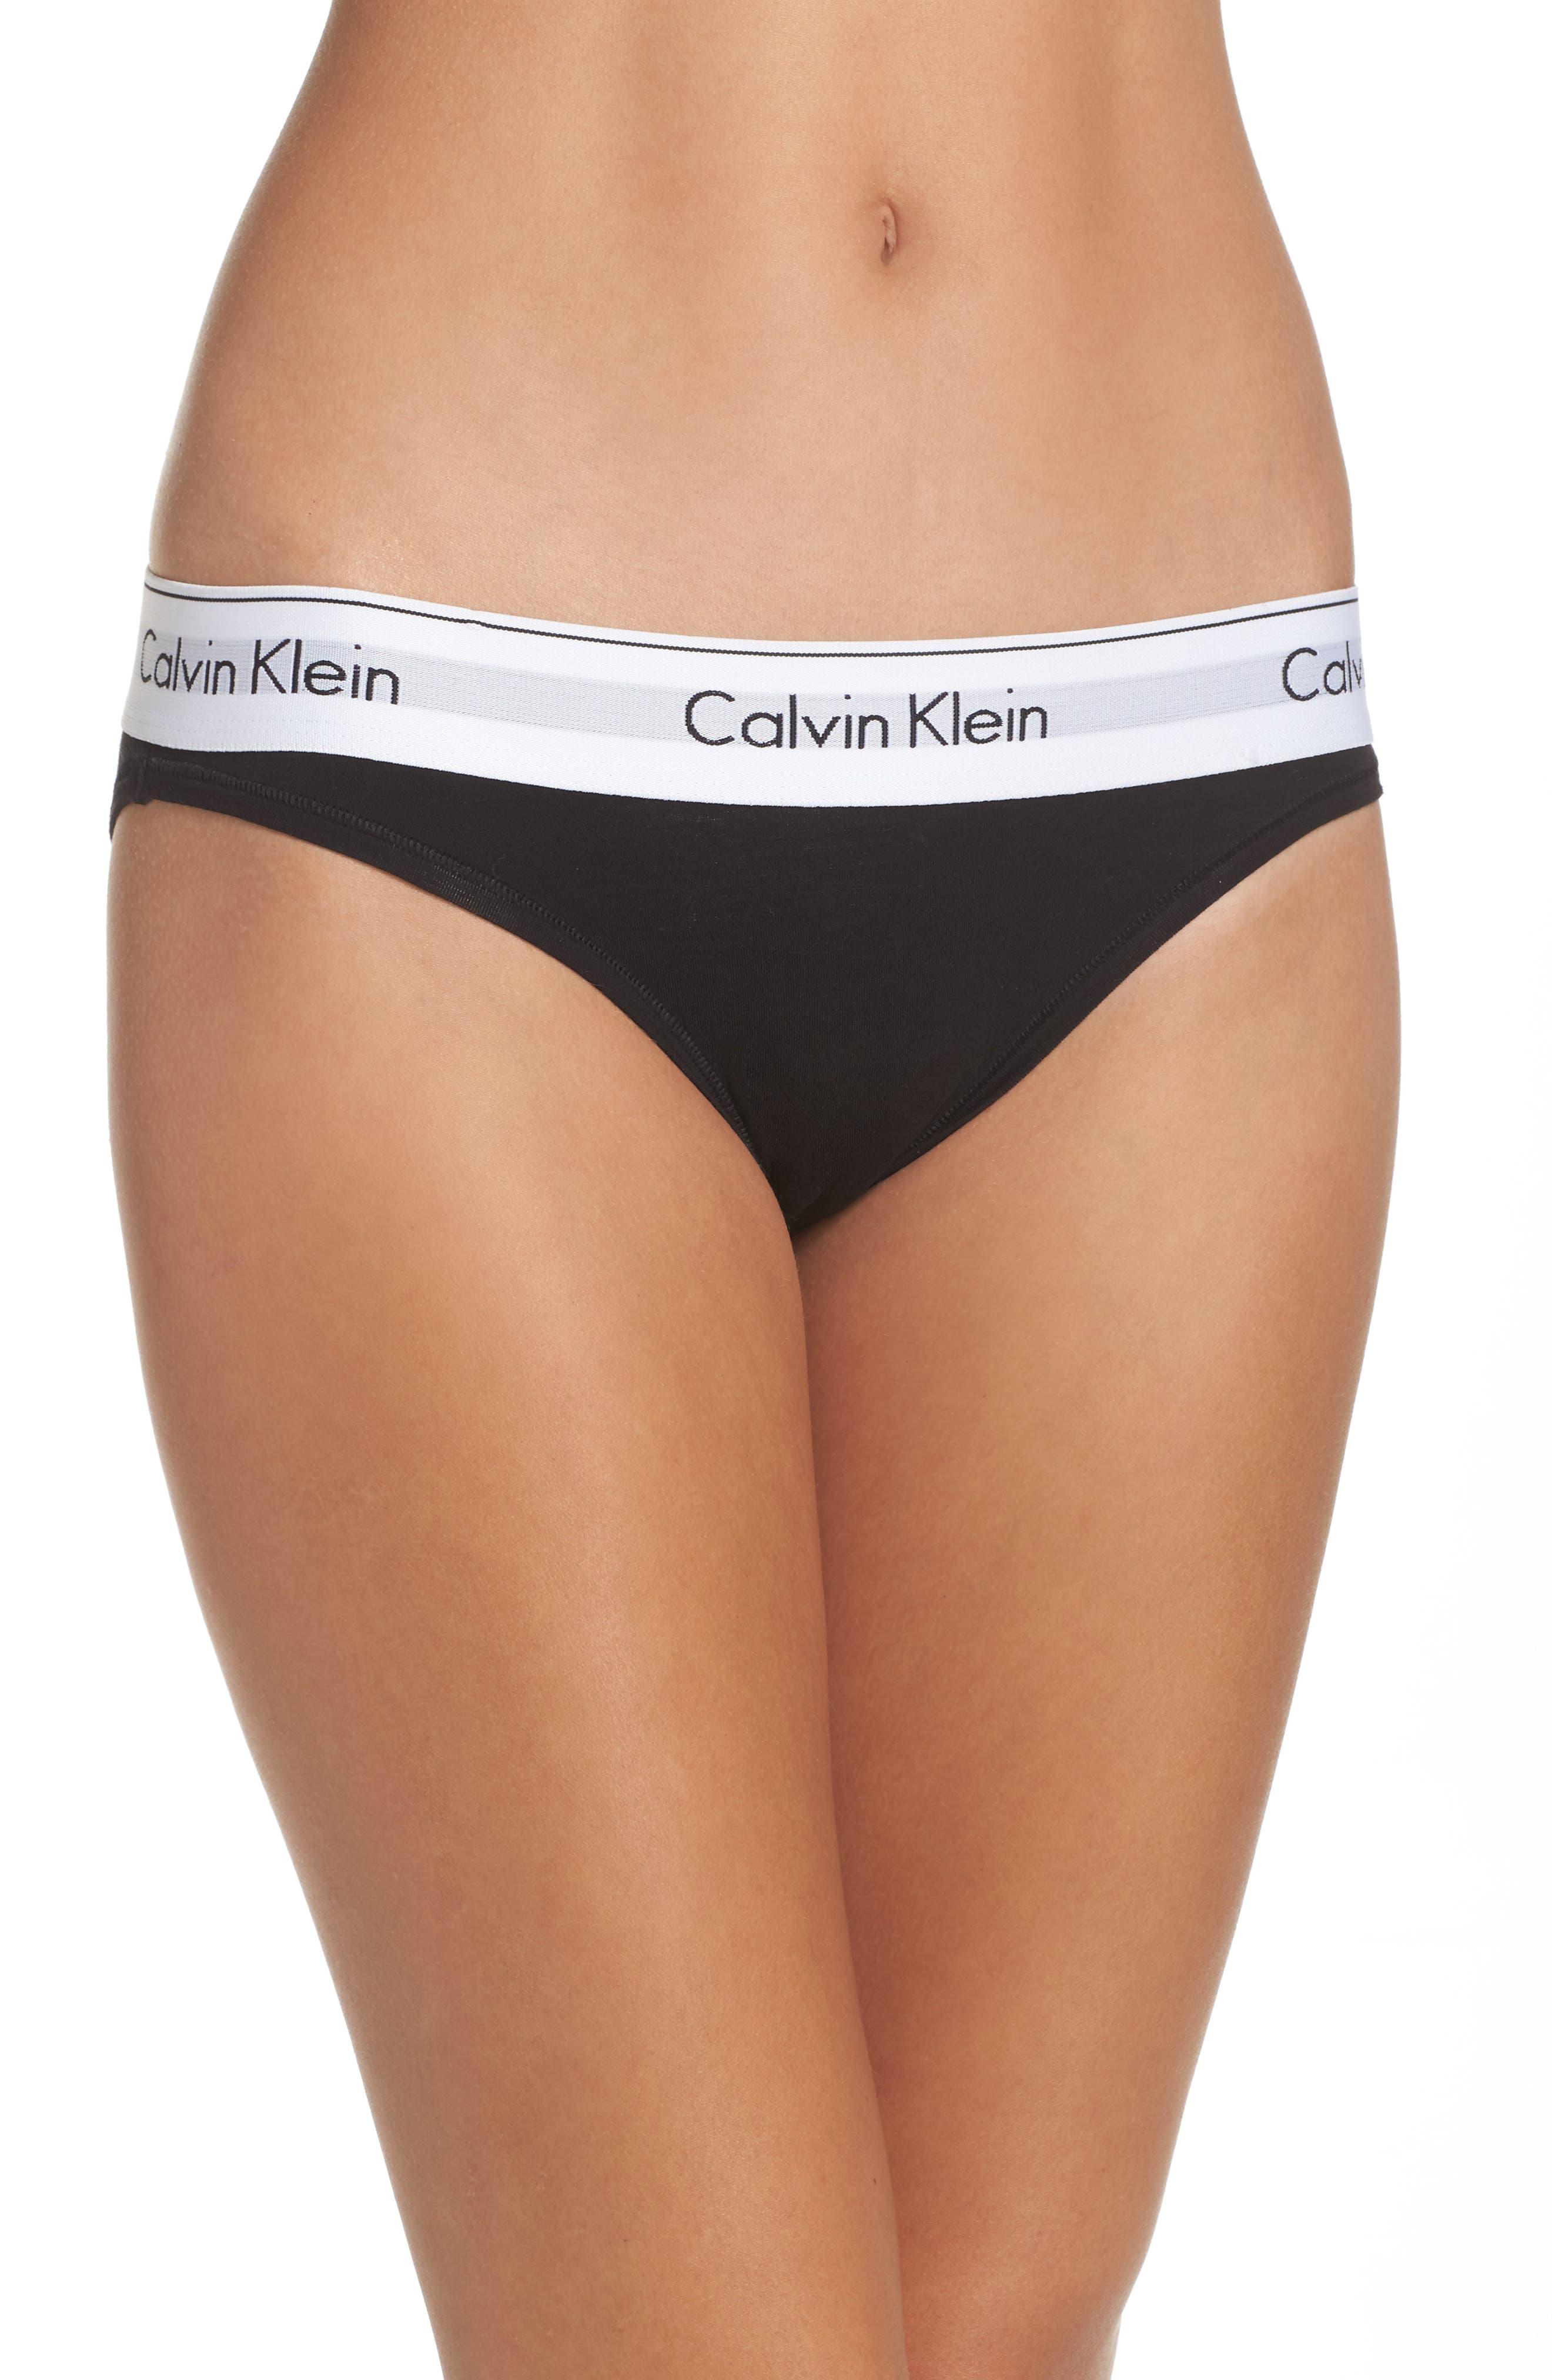 'Modern Cotton Collection' Cotton Blend Bikini,                             Alternate thumbnail 2, color,                             BLACK